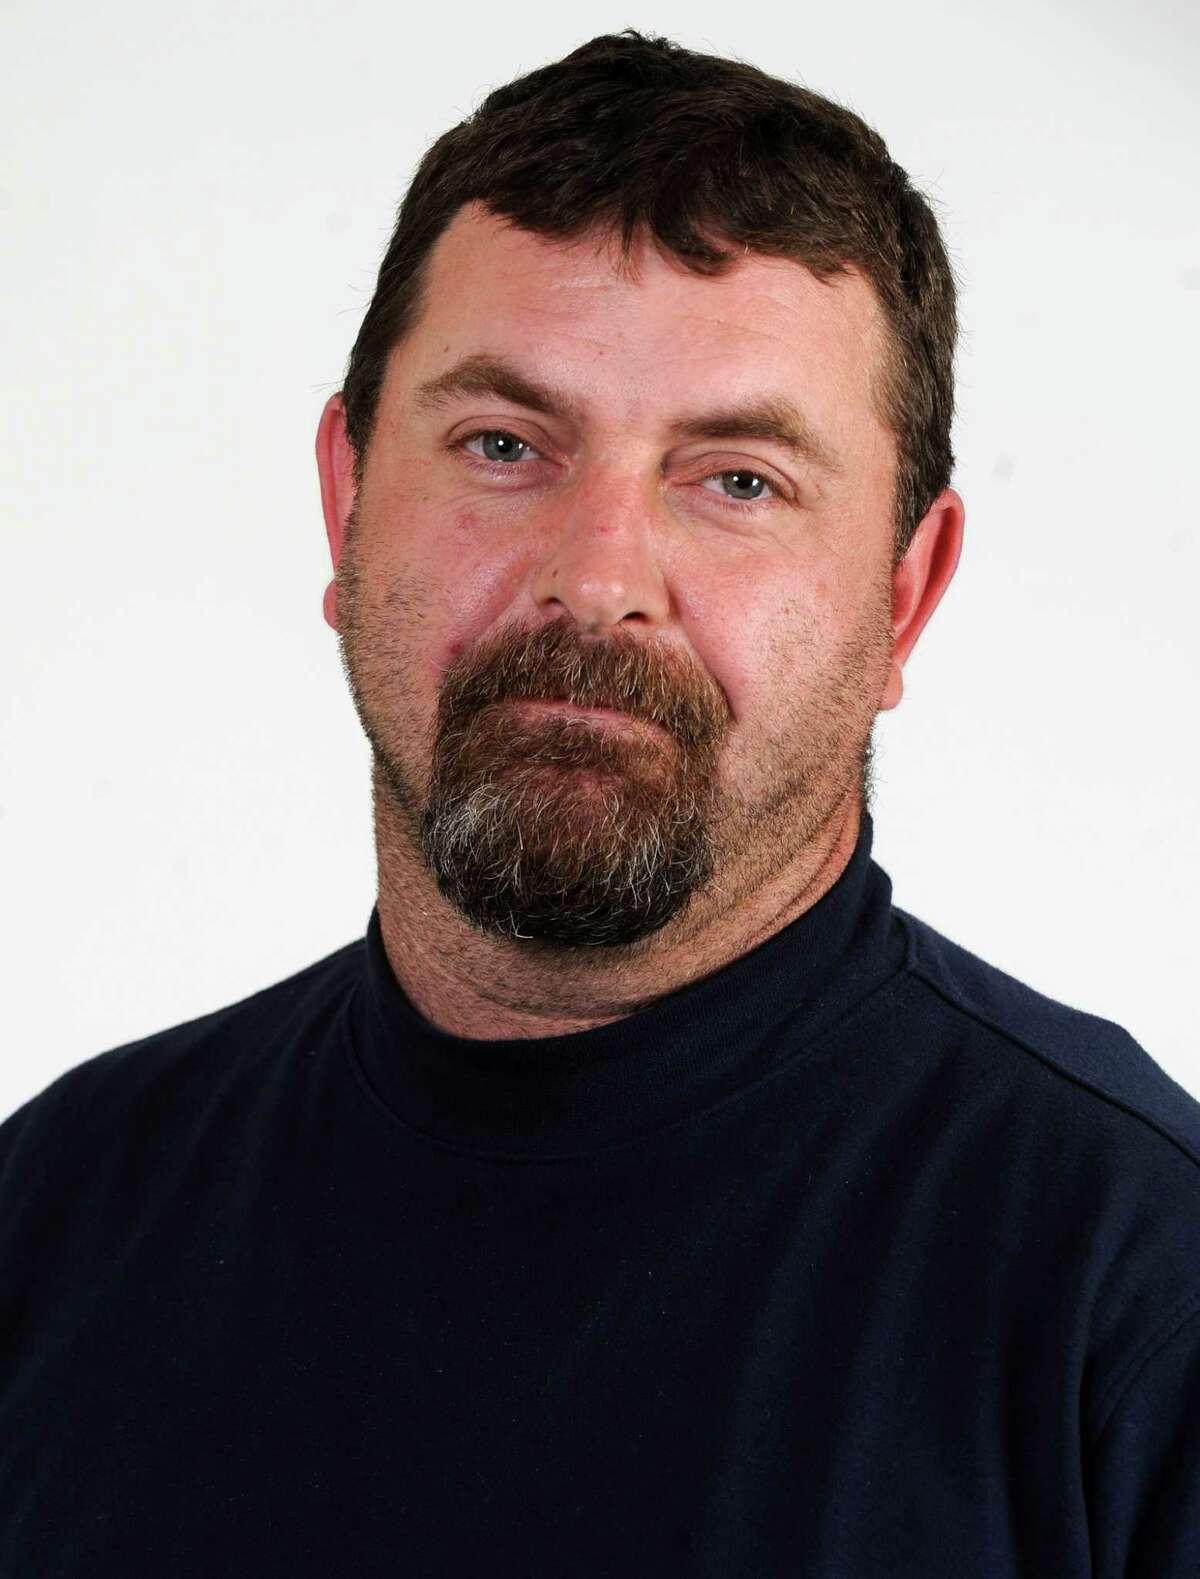 Former Bridgeport Republican City Sheriff David Goodman, 41, died suddenly Saturday, Dec. 19, 2015.